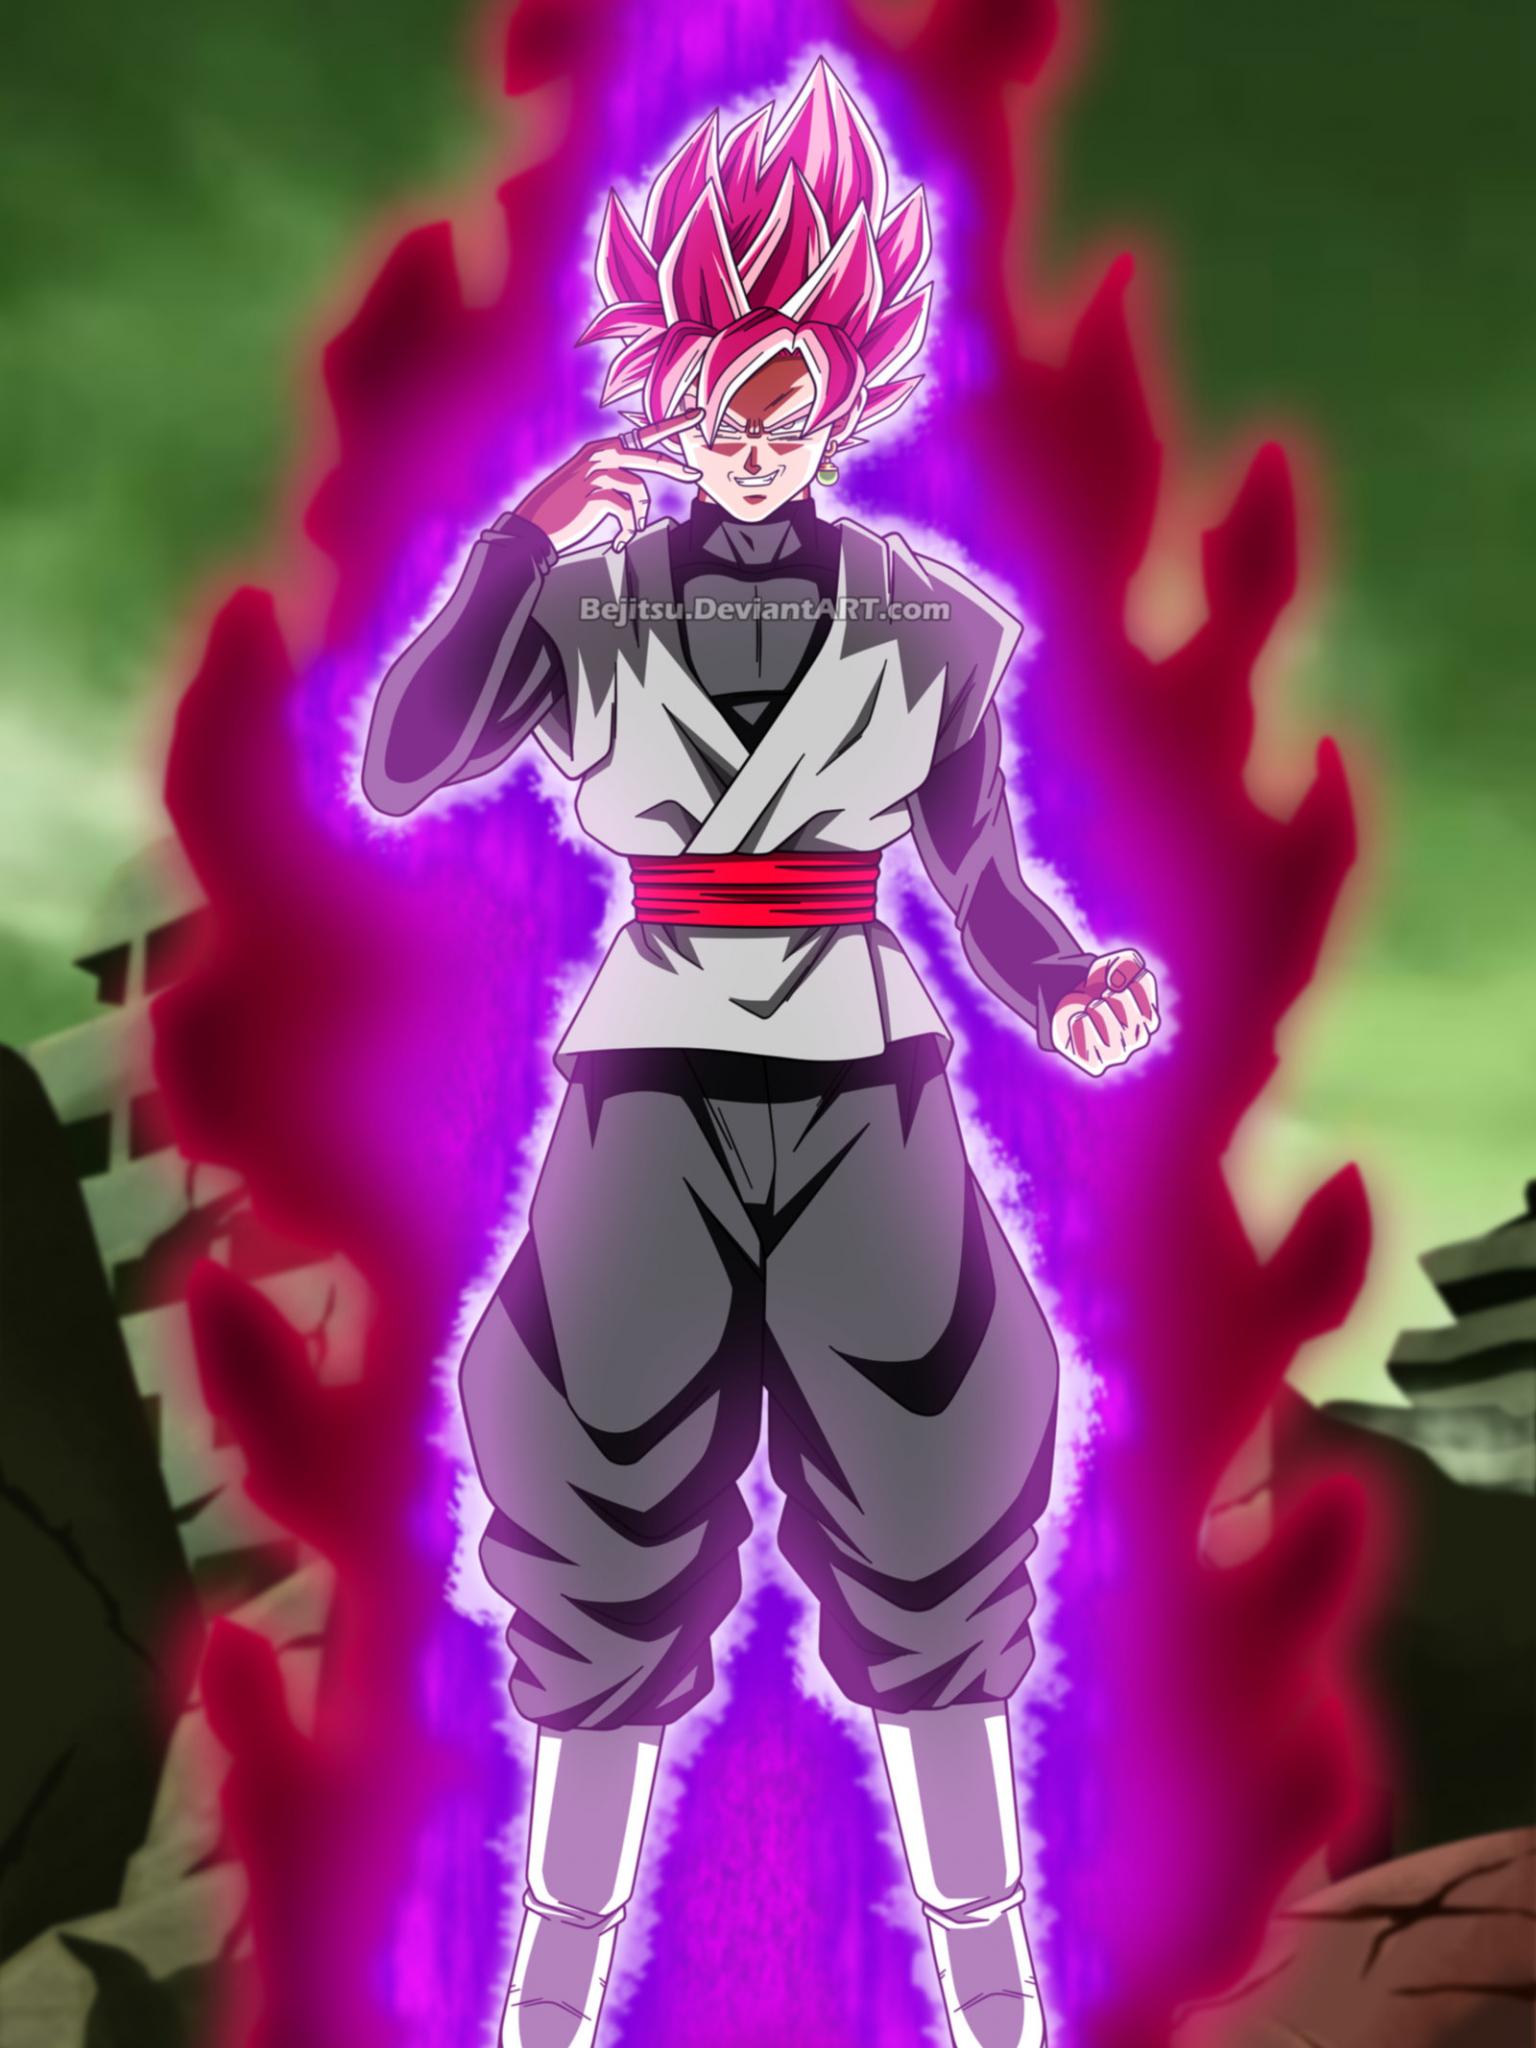 Free Download Dragon Ball Super Black Goku By Bejitsu 1600x2344